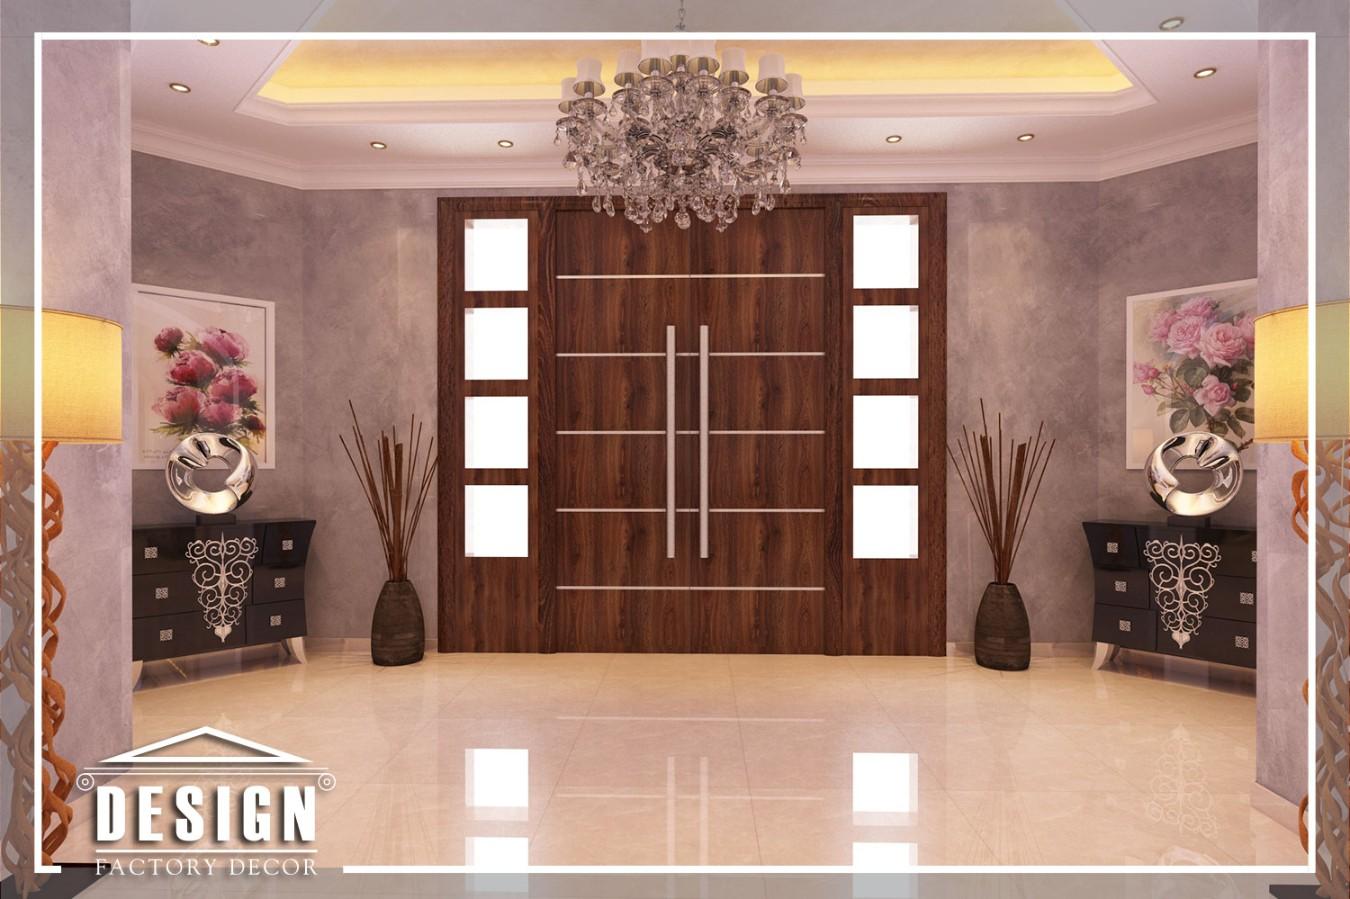 Villas Interior Design - Design Factory Decor